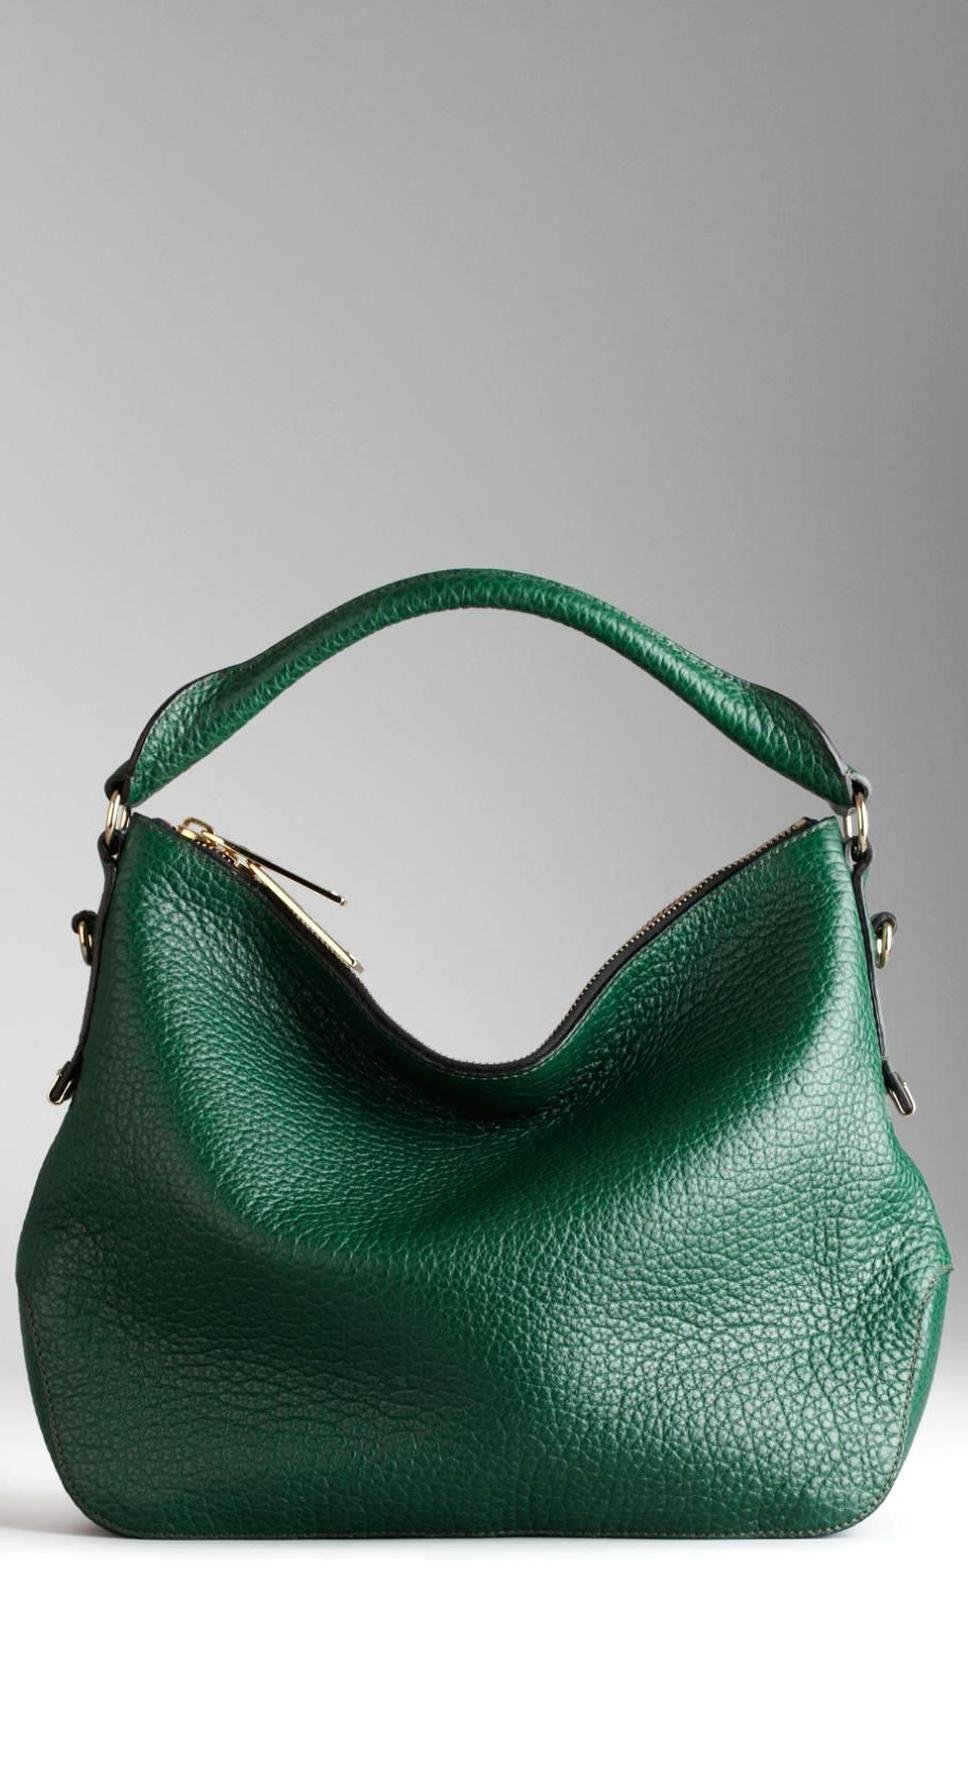 Small Heritage Grain Leather Hobo Bag Burberry In 2020 Trending Handbag Vegan Purse Handbags Bags